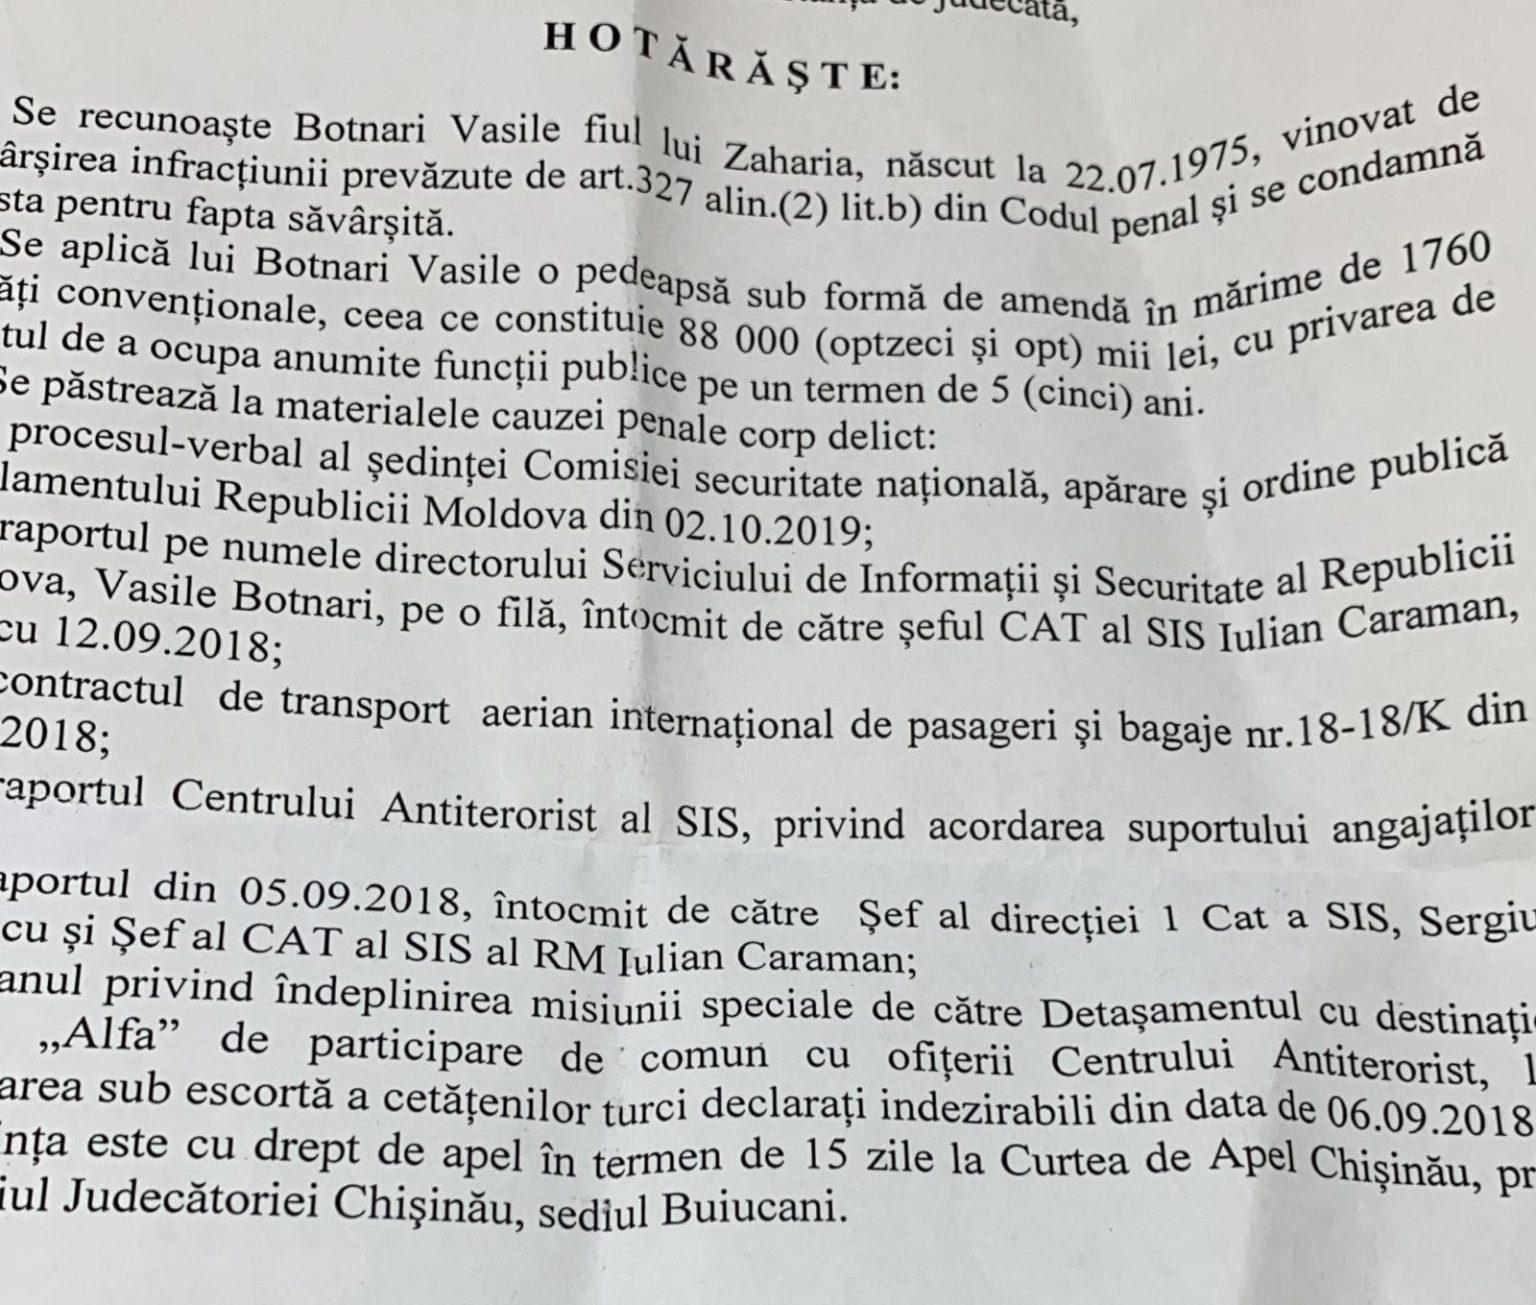 Экс-глава СИБа Ботнарь отделался штрафом? Литвиненко требует объяснений от генпрокурора (DOC)